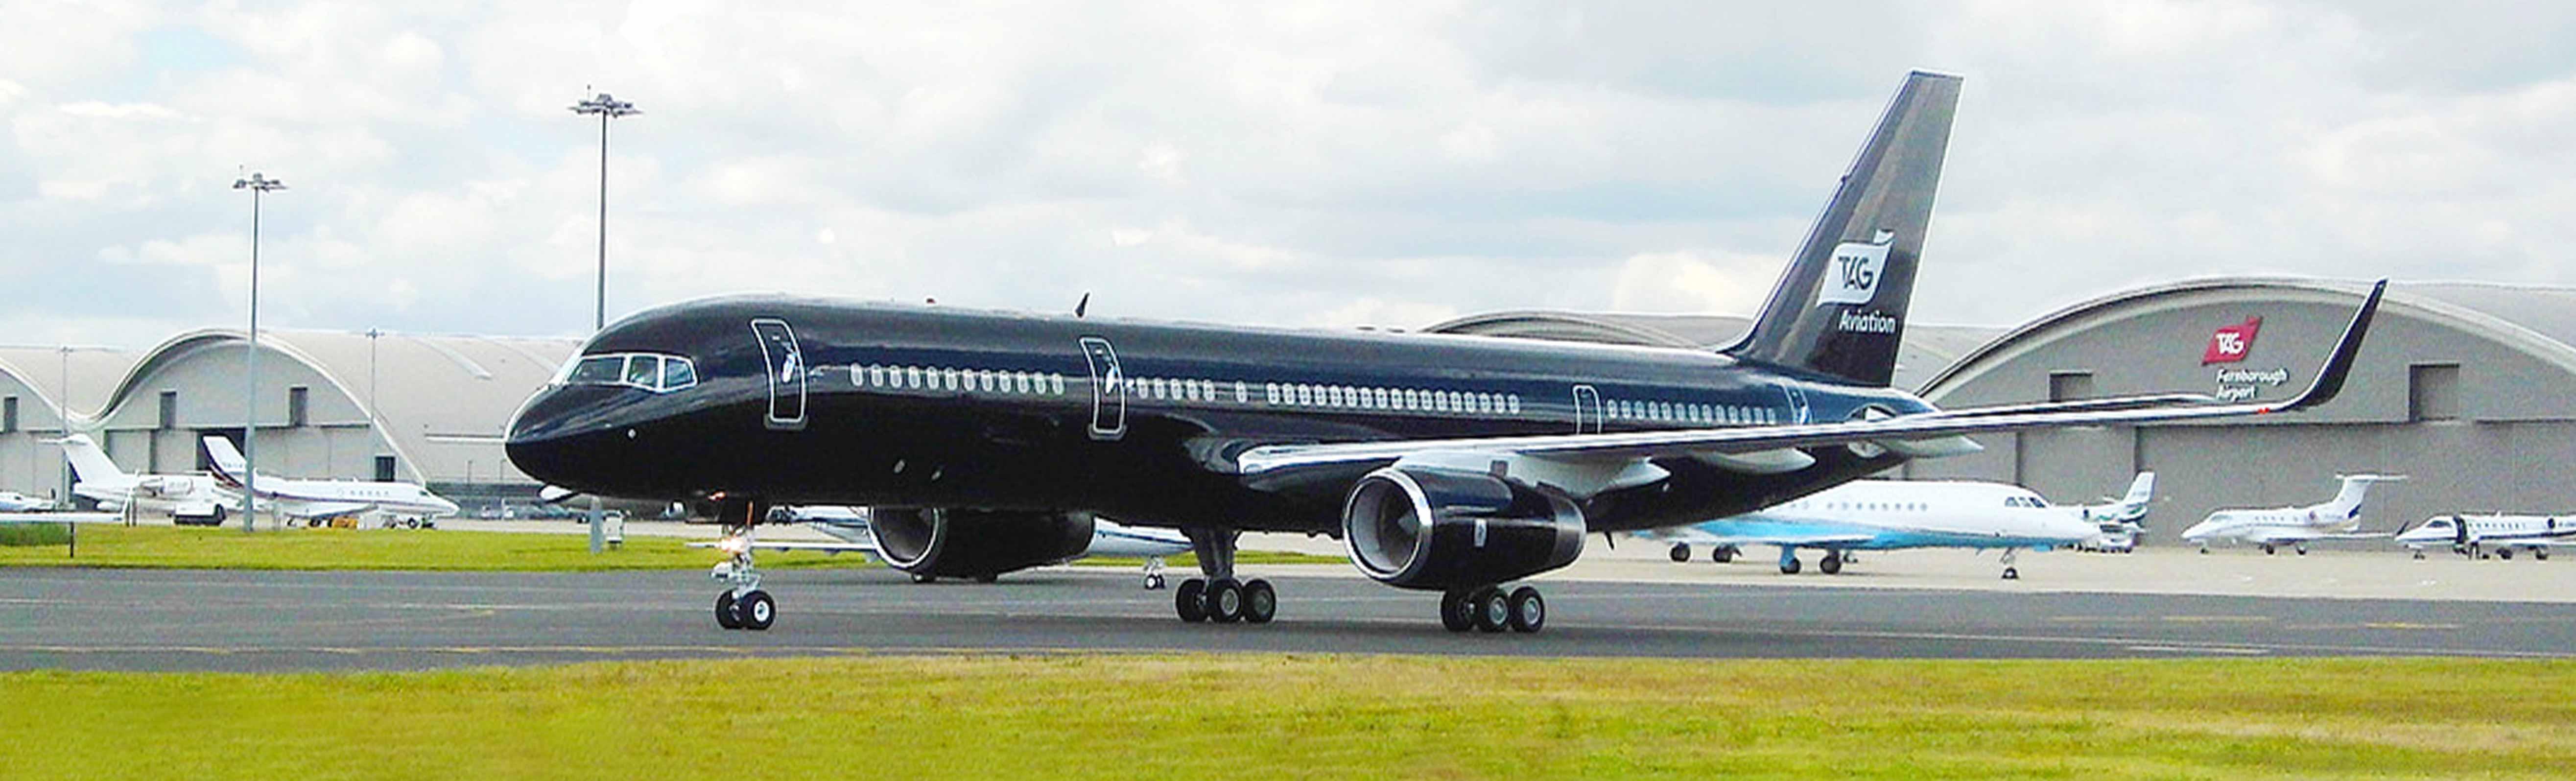 TAG航空的豪华B757飞机参与2016年度范保罗国际航展